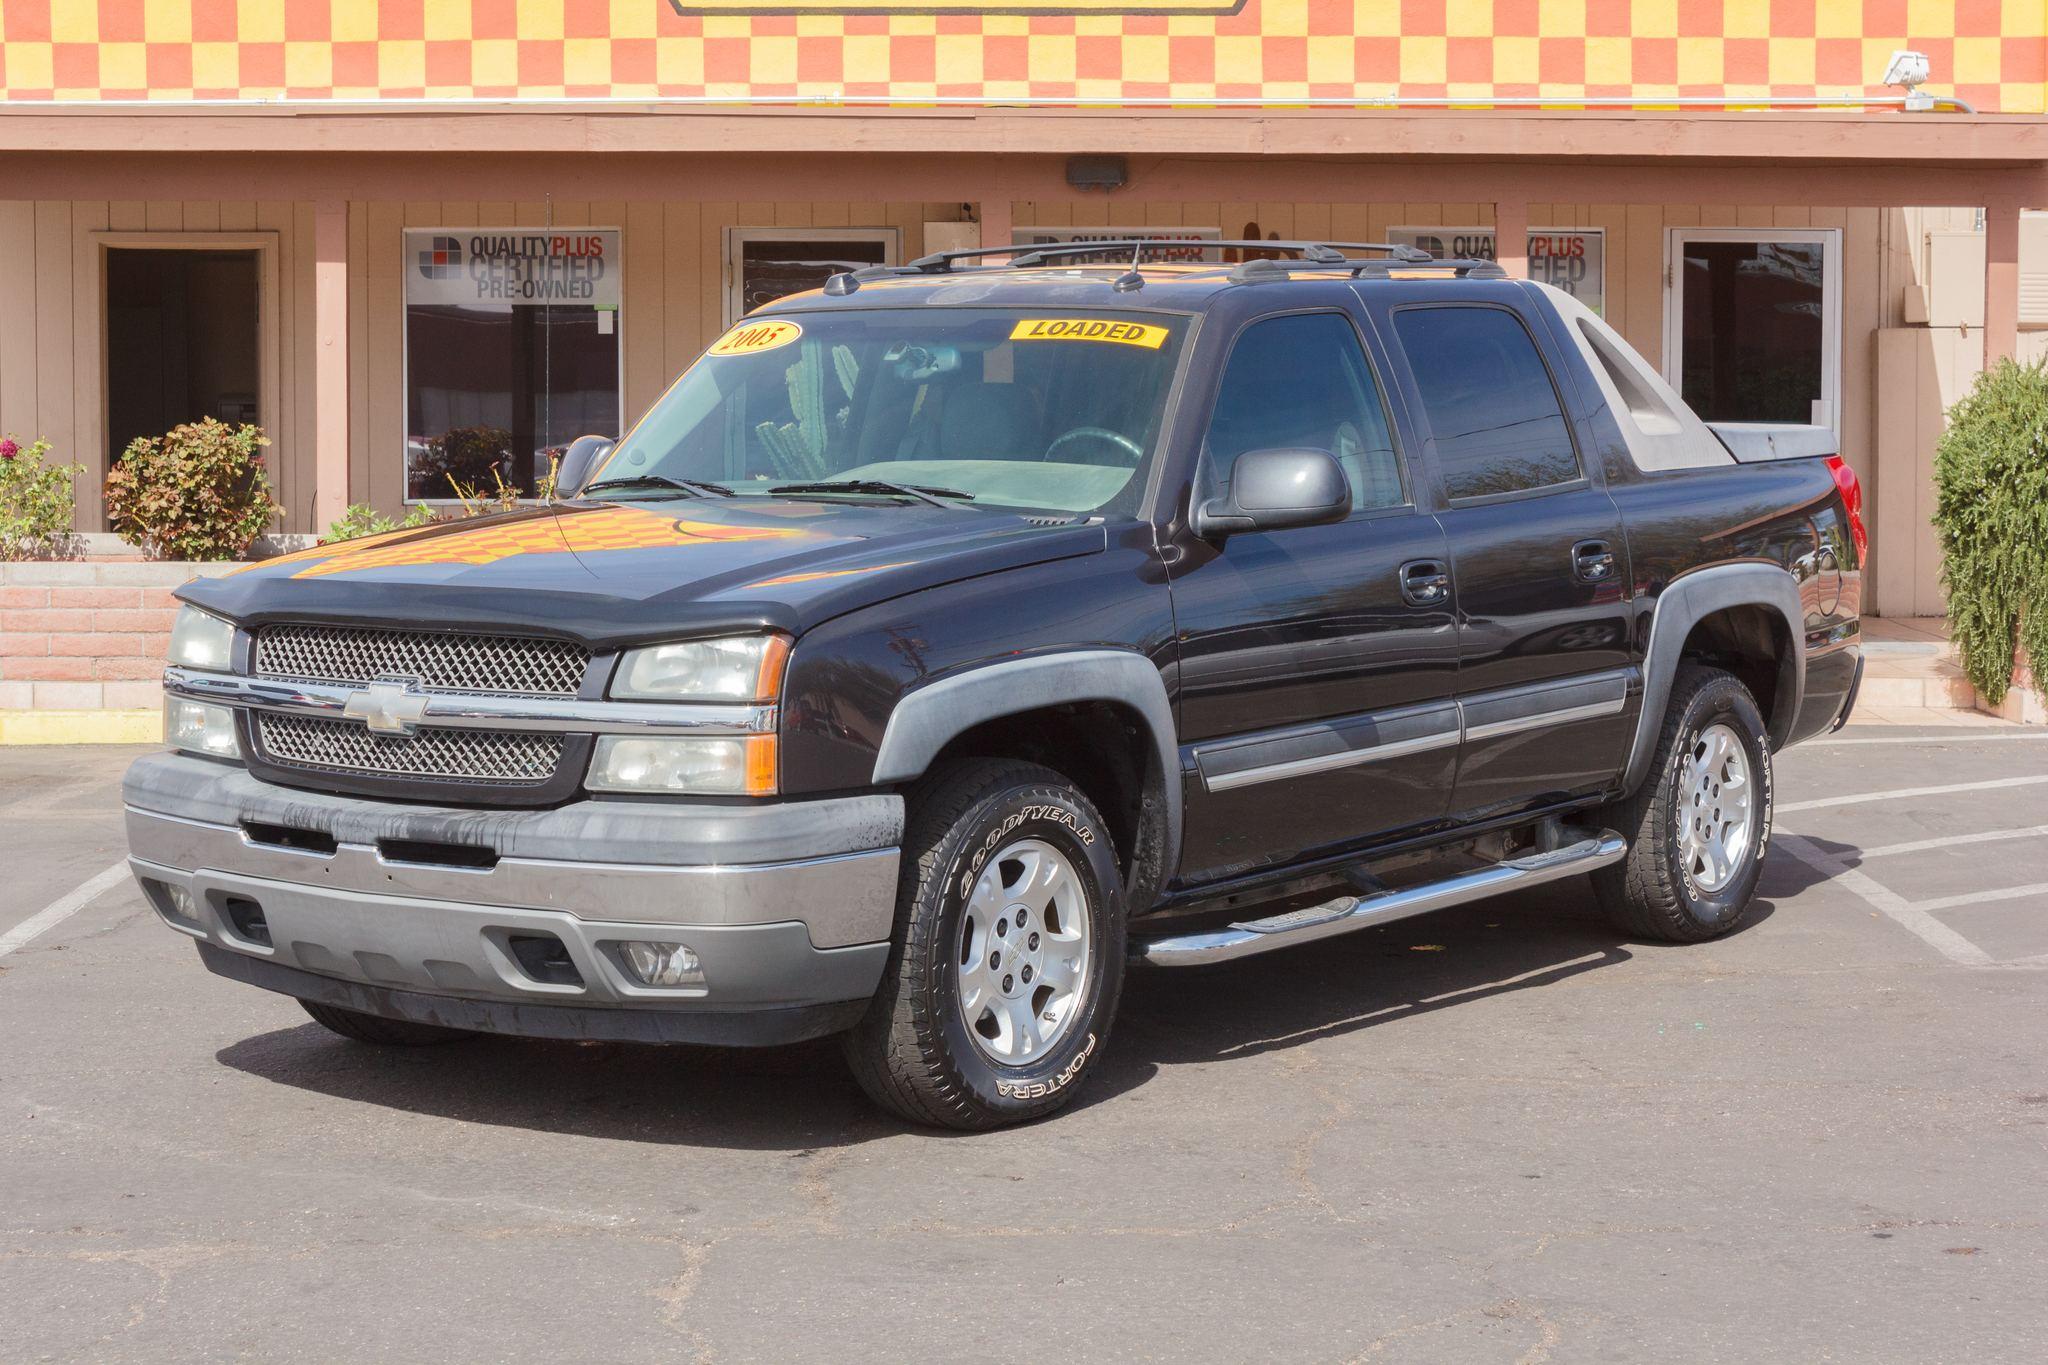 Photo of 2005 Chevrolet Avalanche 2WD 1500 Wagon LT Black